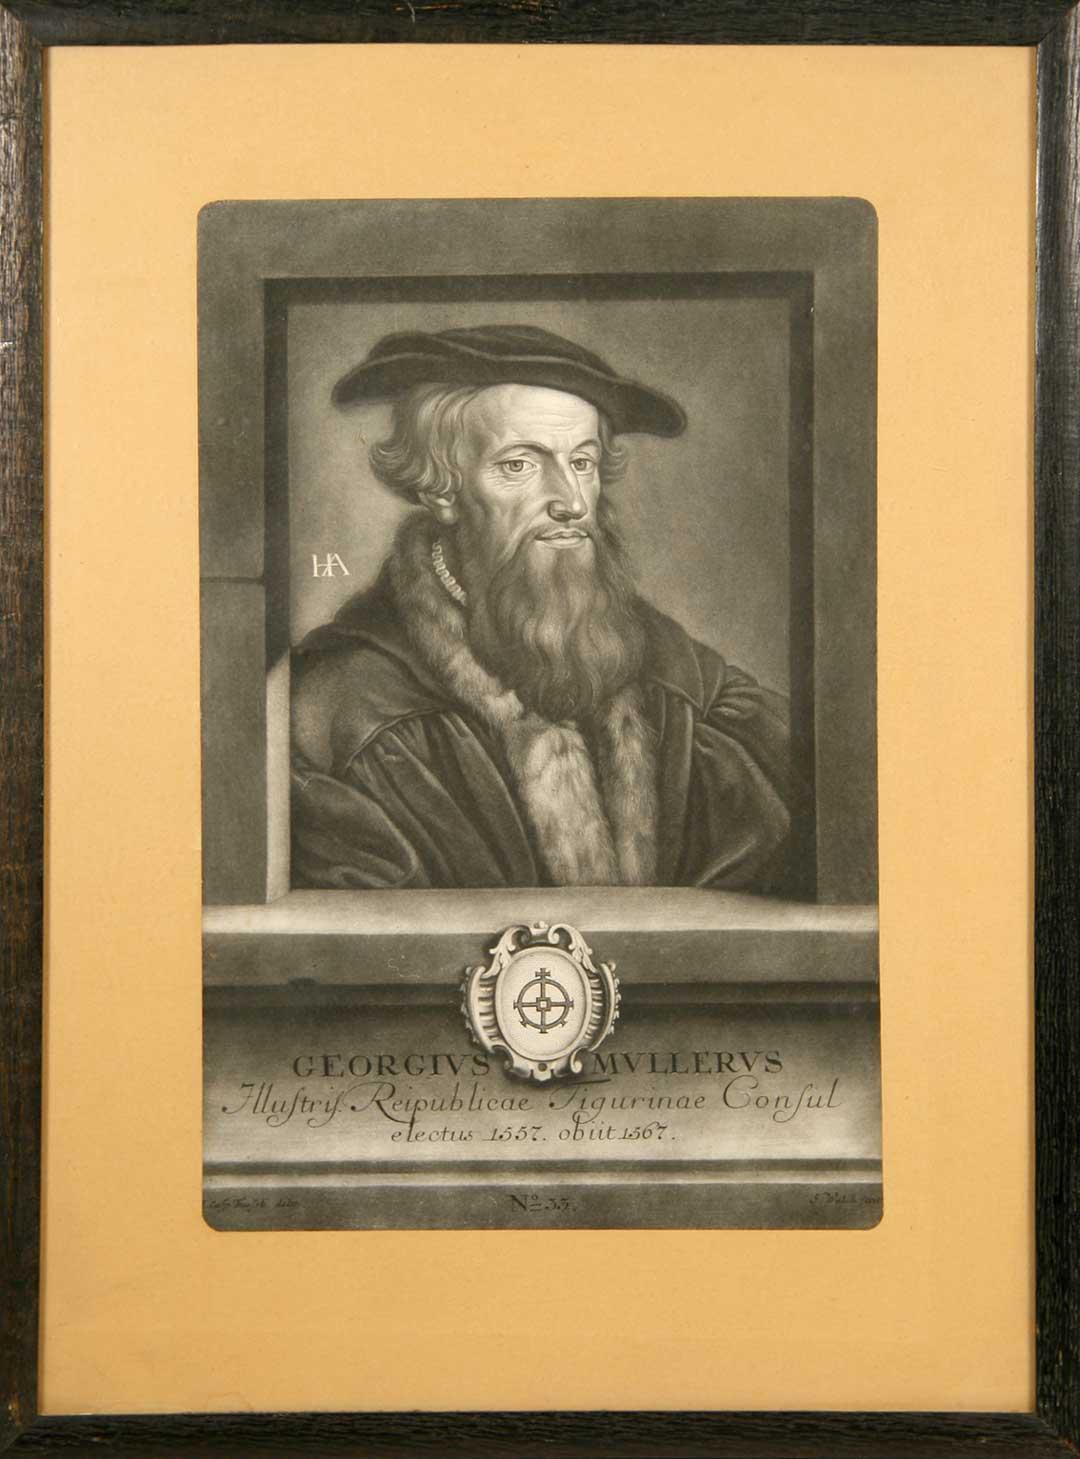 Georgius Mullerus. Reipublicae Tigurinae Consul A° 1557-1567: Walch, S. portraits